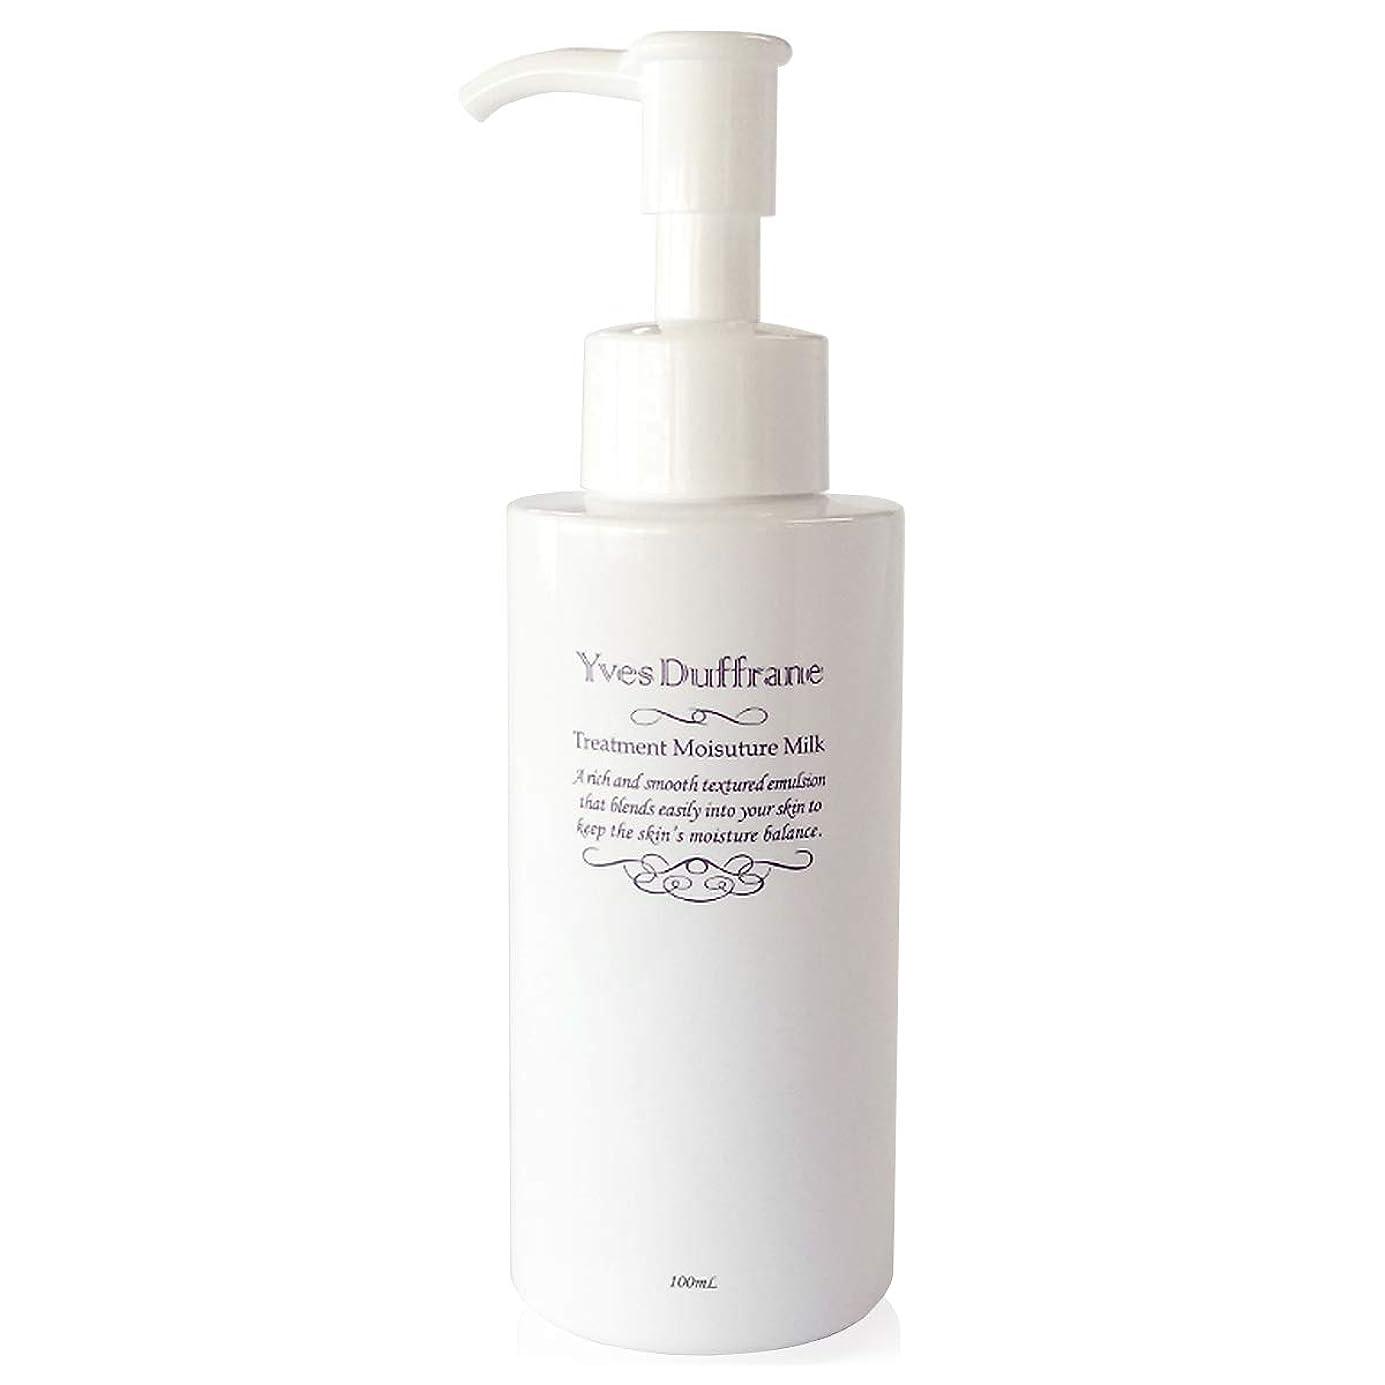 再編成する弾薬出身地乳液/セラミド アミノ酸 配合 [ 美容乳液 ] 増粘剤不使用 保湿 乾燥?敏感肌対応